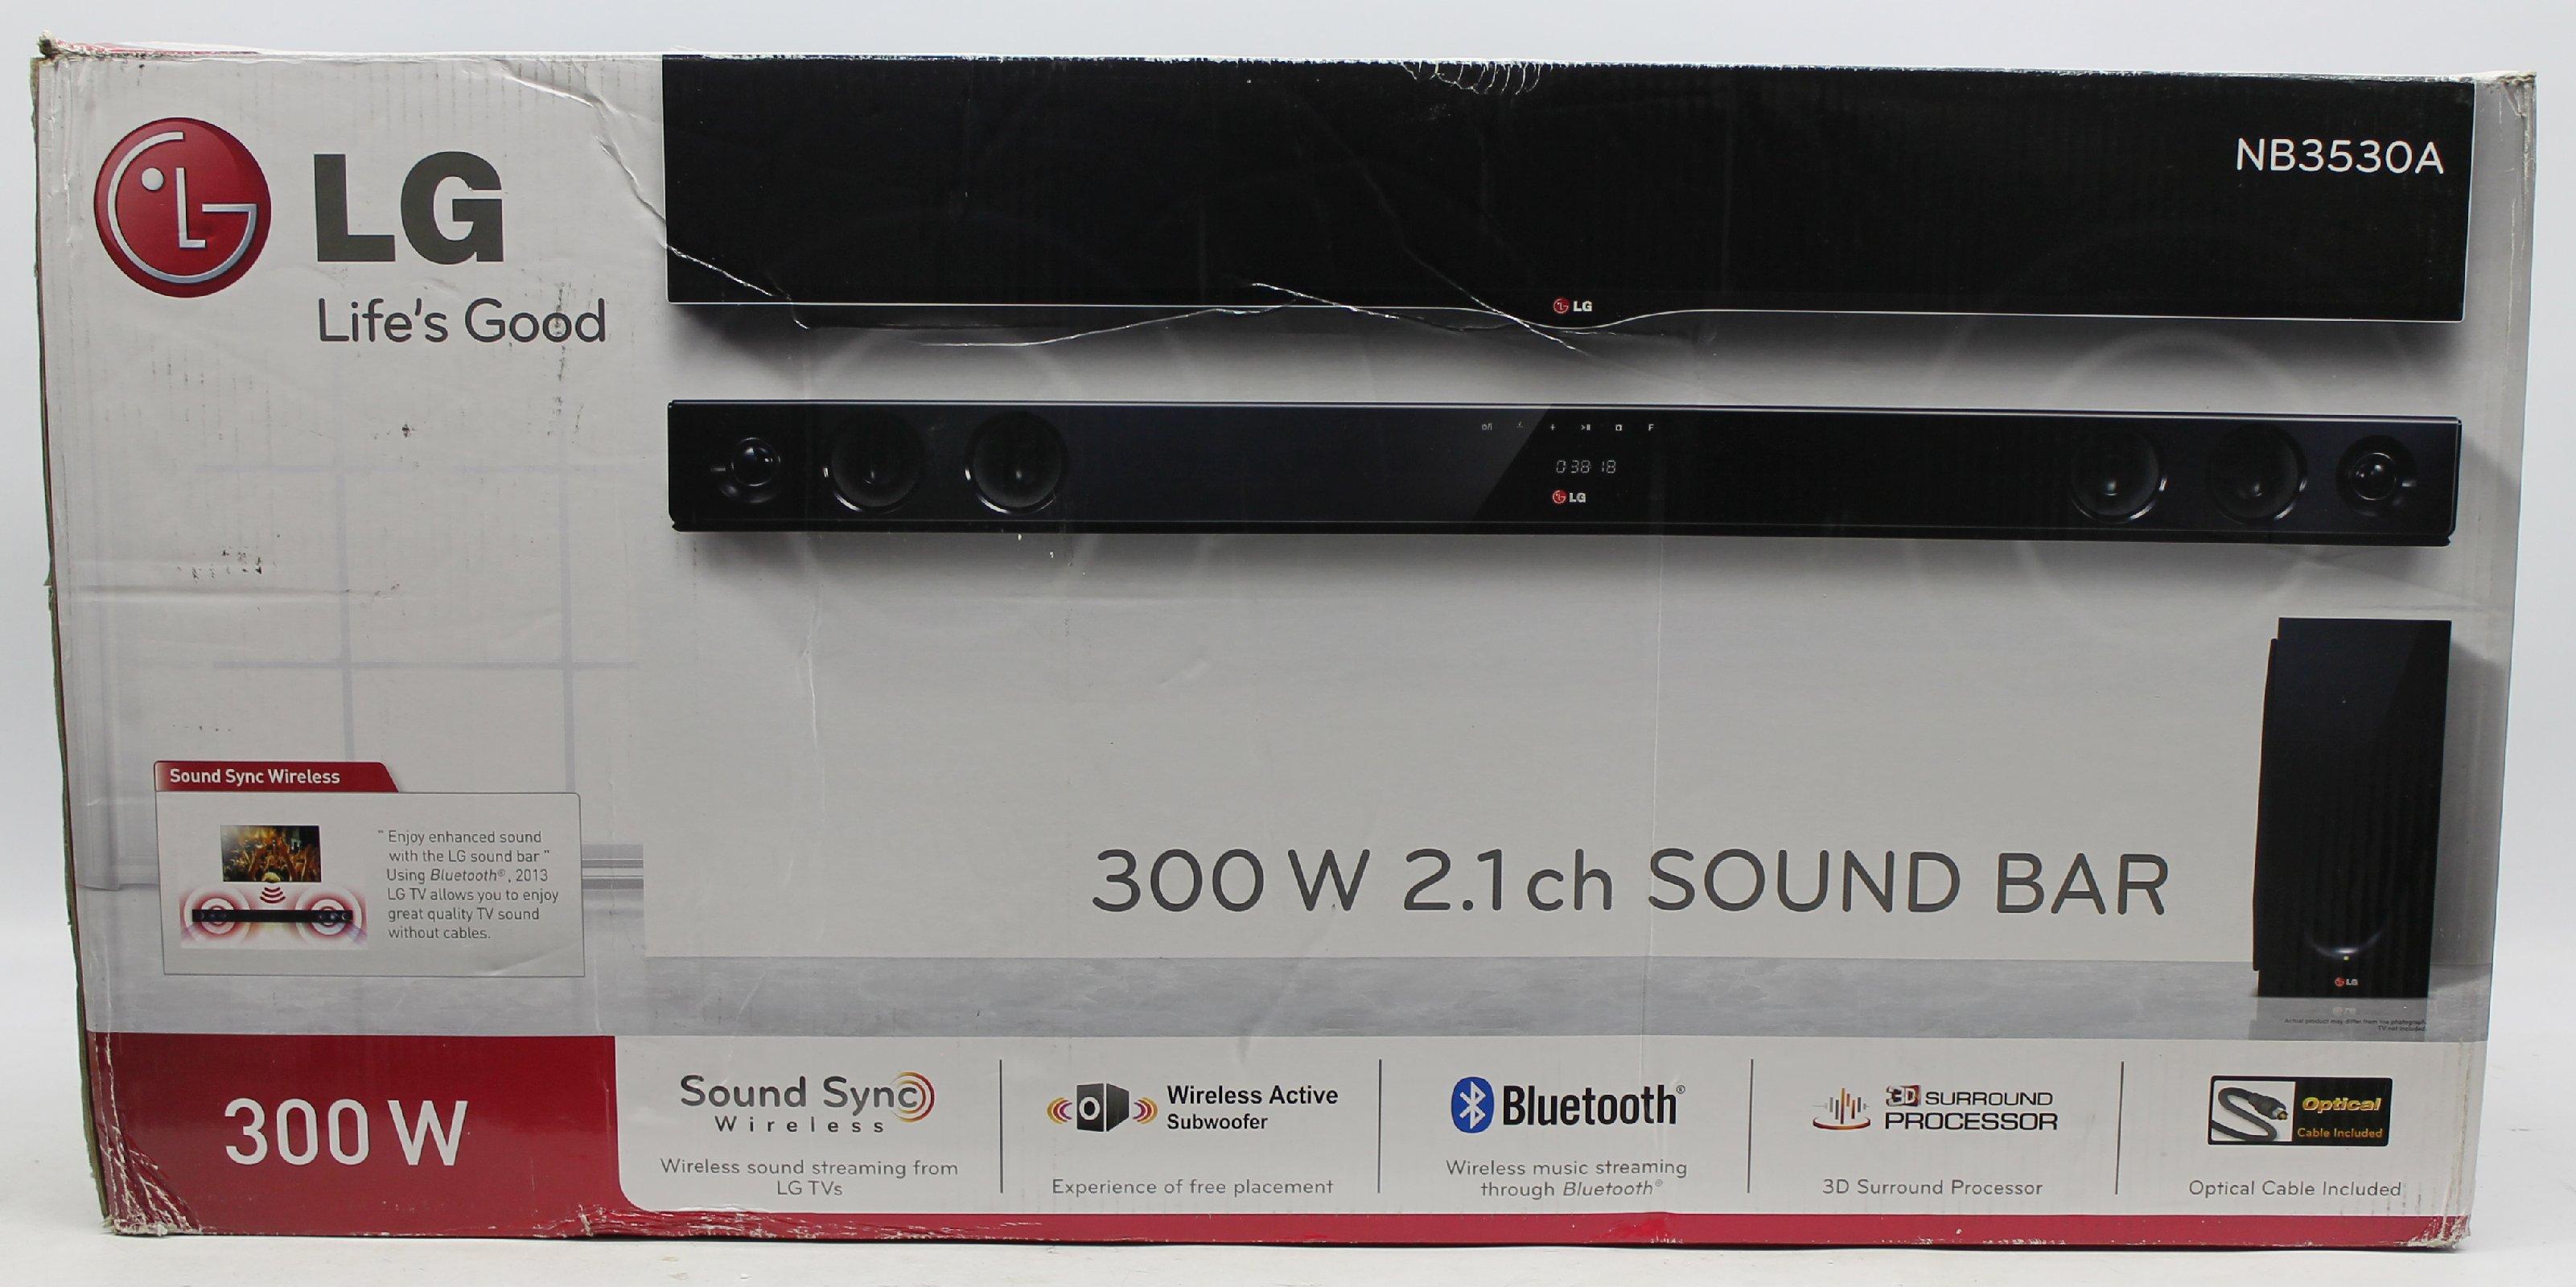 lg nb3530a 2 1 soundbar mit wireless subwoofer 300 watt usb schwarz ebay. Black Bedroom Furniture Sets. Home Design Ideas